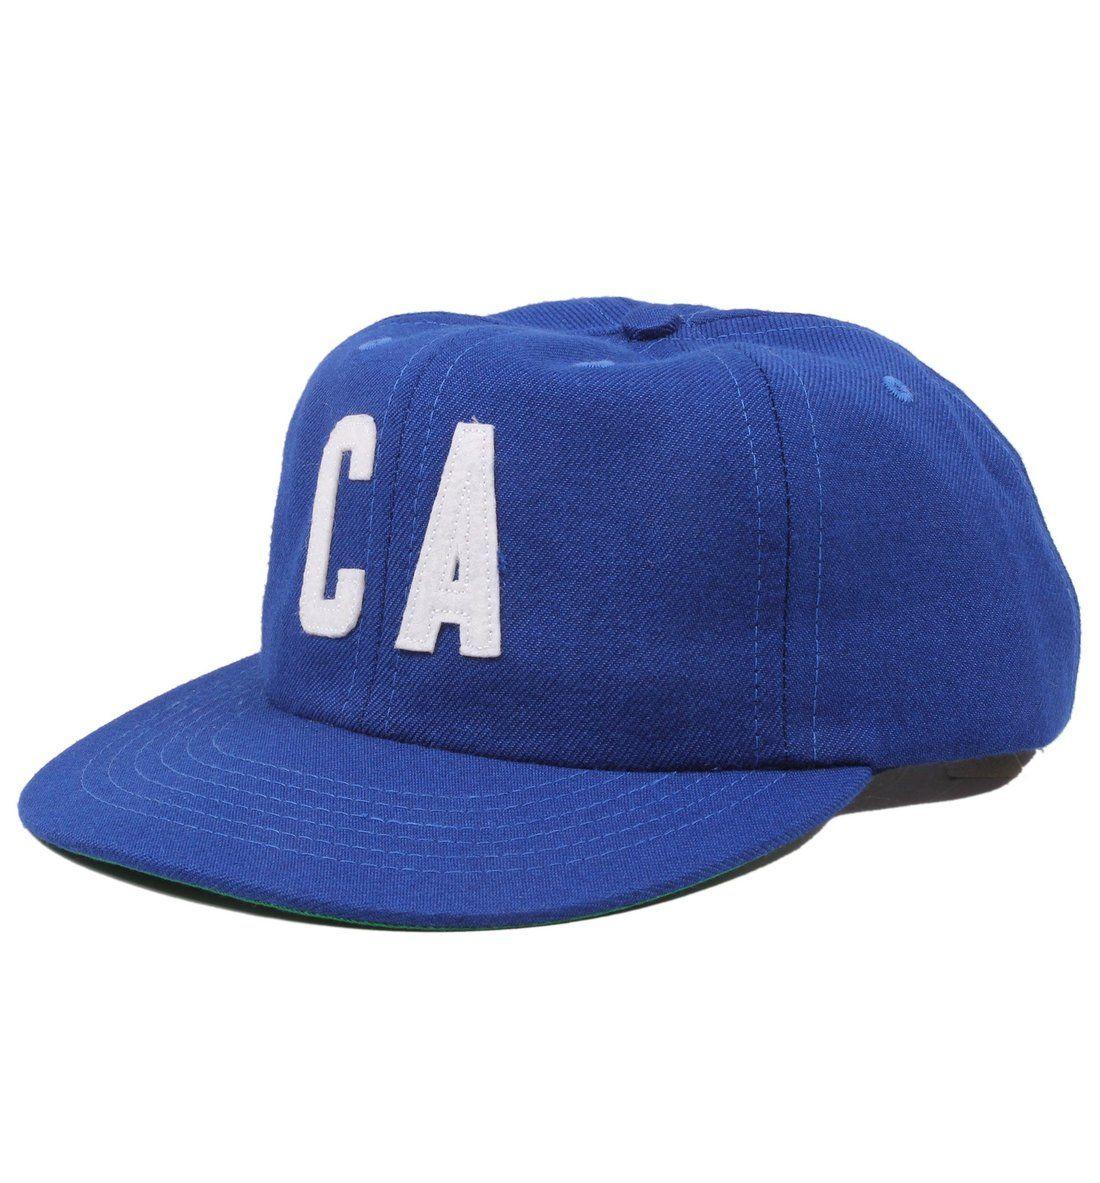 898b49f7282 Best Coast 3 Hat - Accessories  Headwear  Hats - Iron and Resin